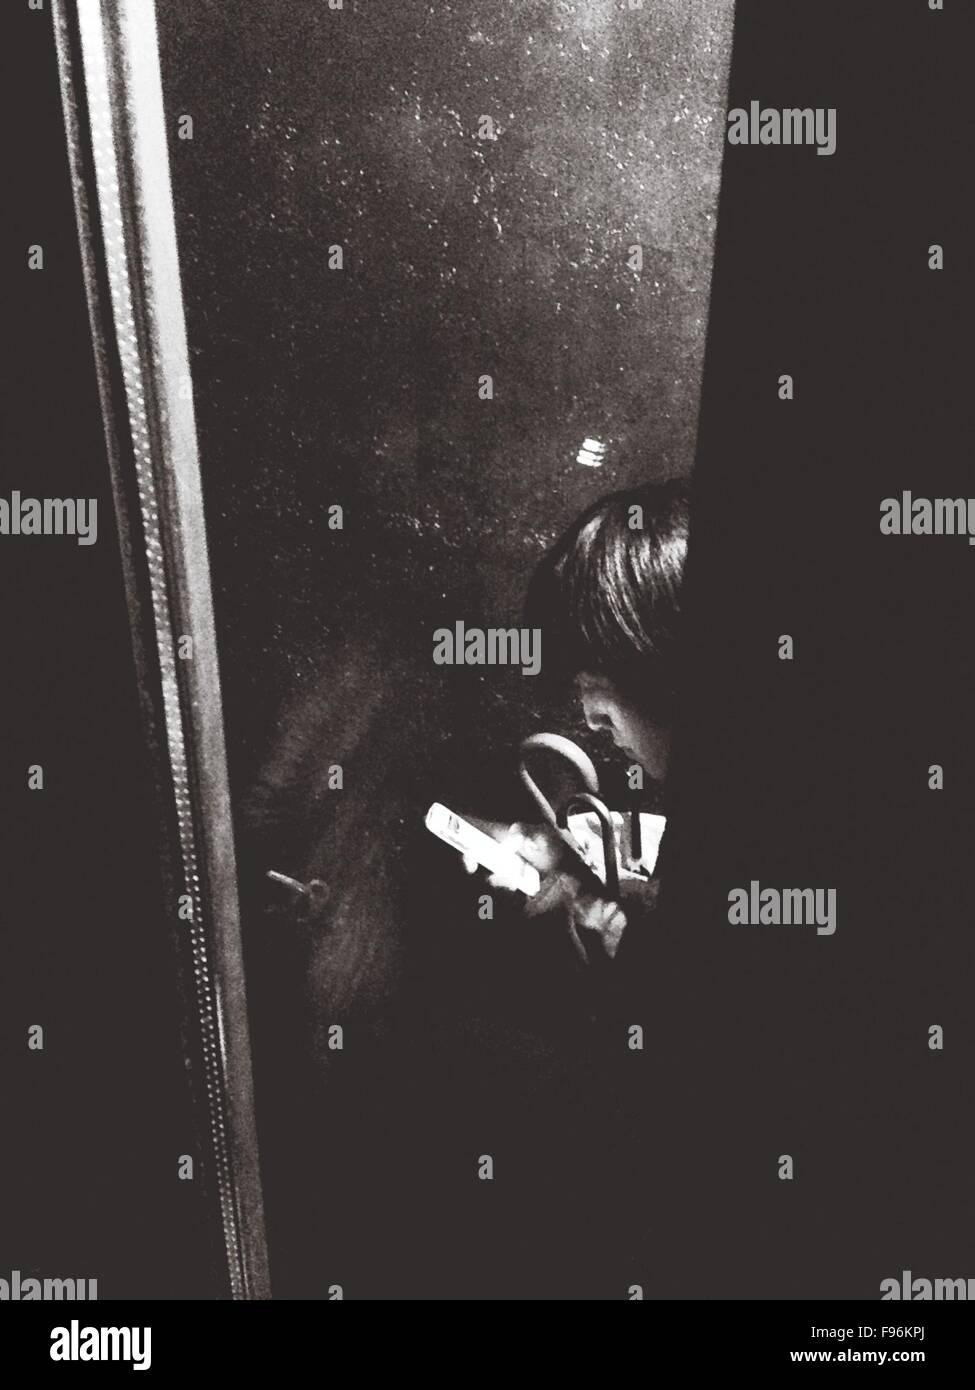 Hombre utilizando Smart Phone vistos a través de la ventana Imagen De Stock